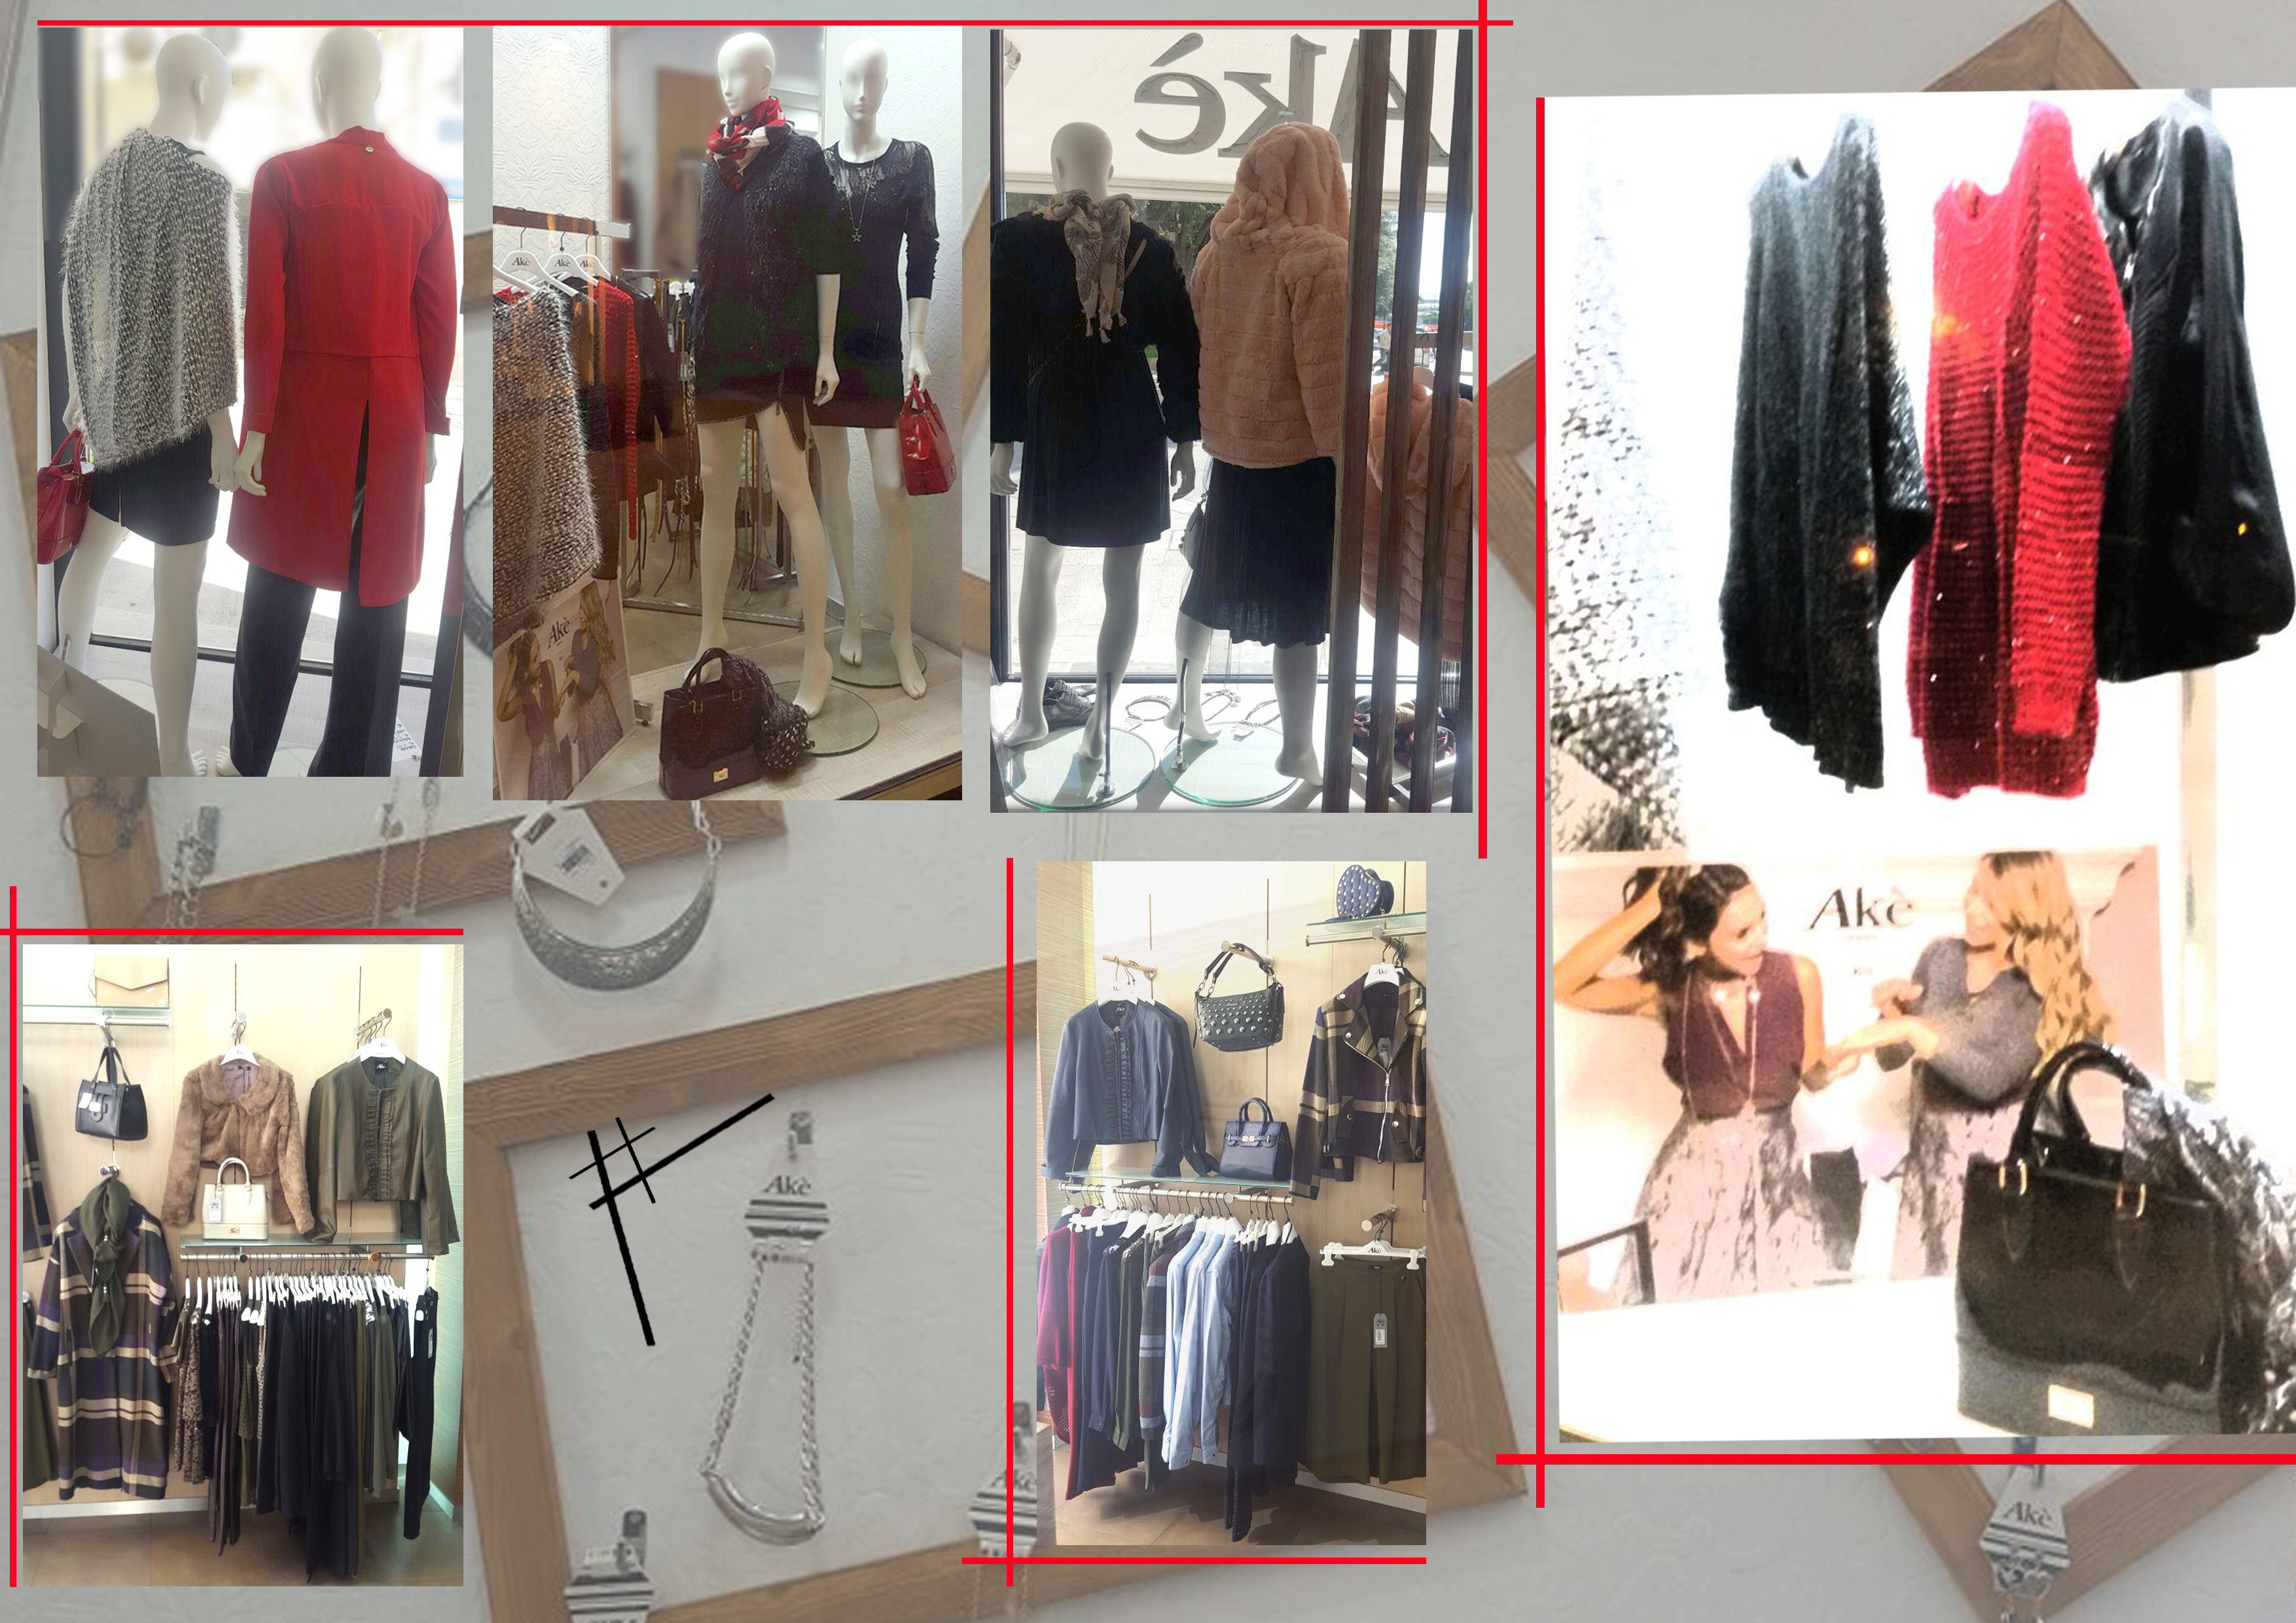 Photo Gallery  - Manfredonia CORSO MANFREDI 261– 71043 MANFREDONIA (FG)